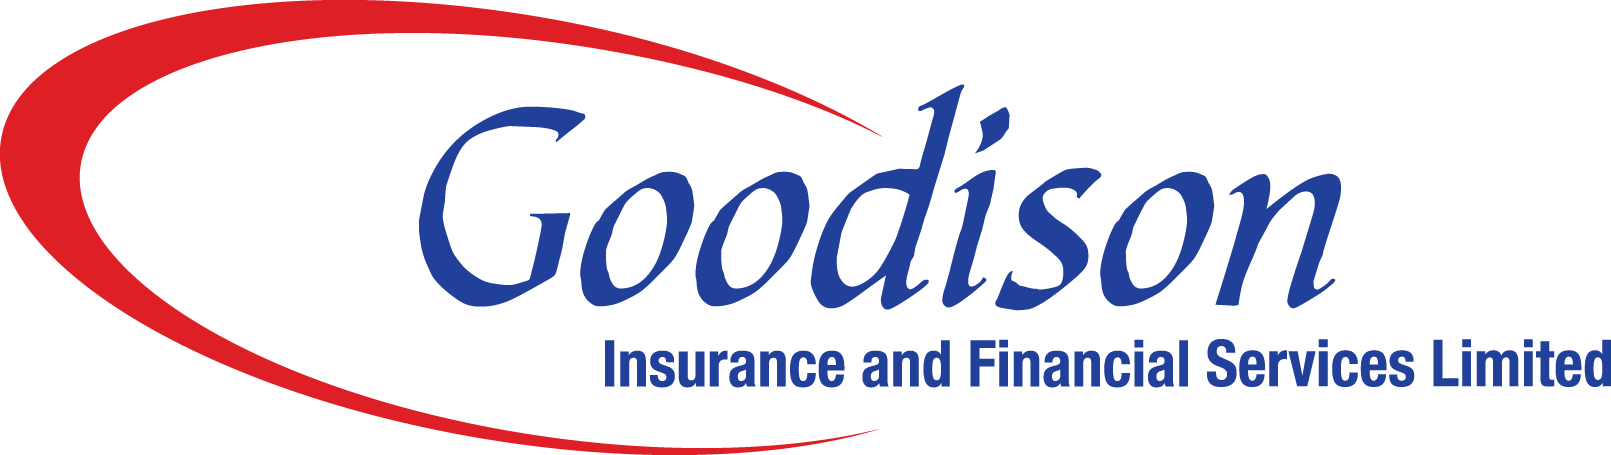 Goodison_Logo.png